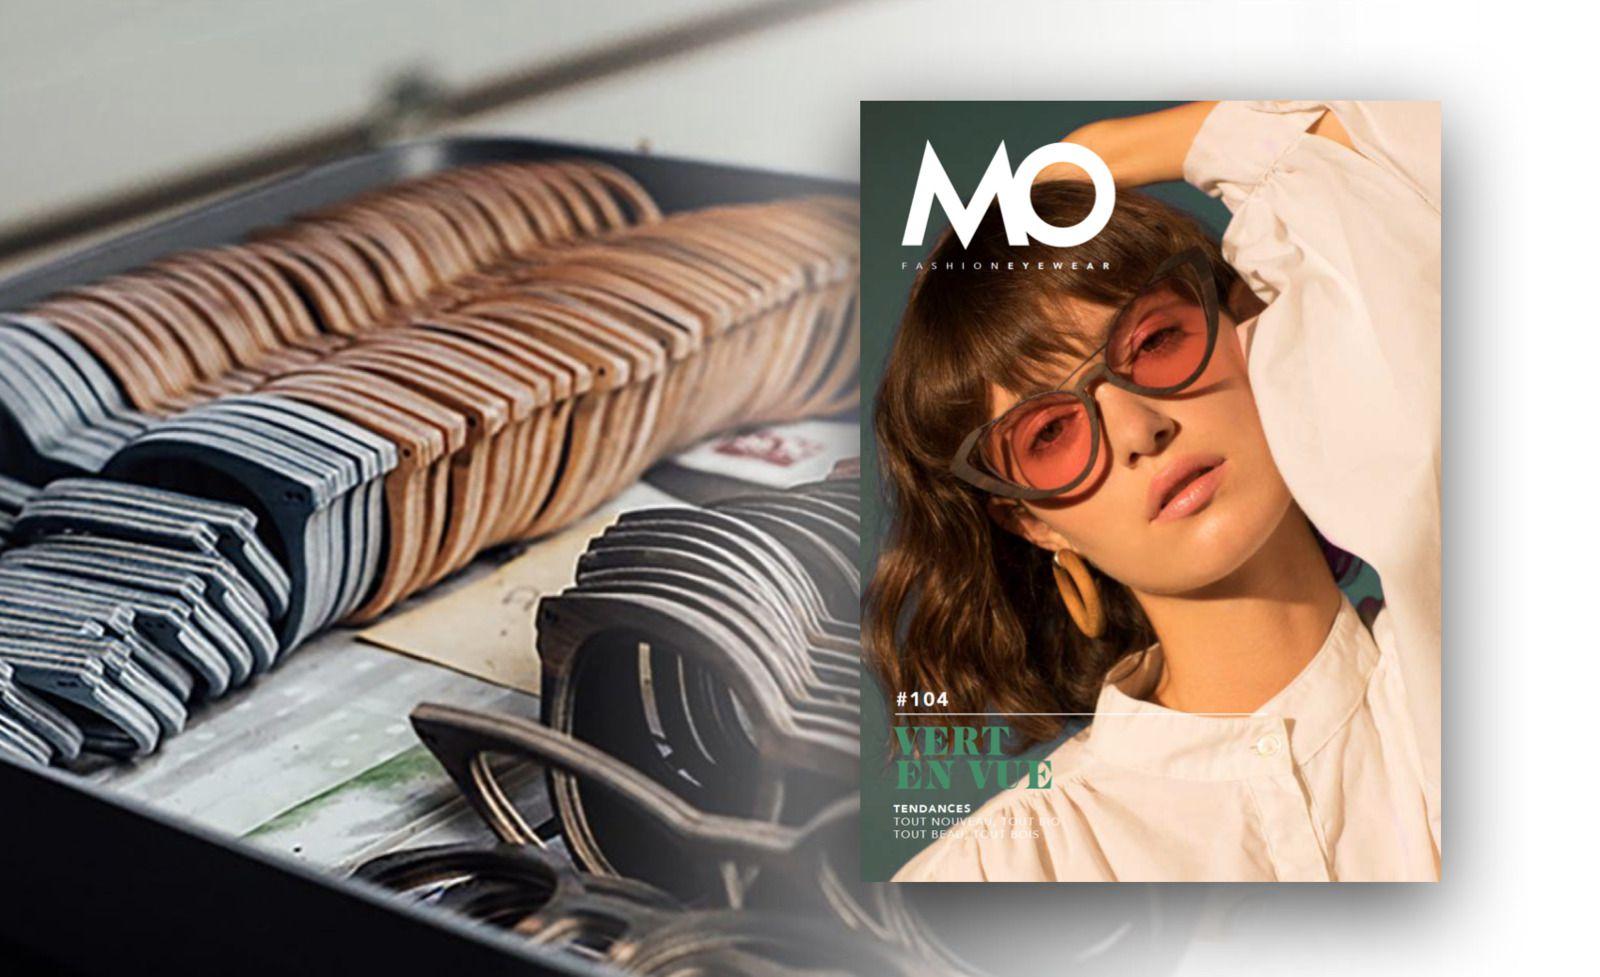 Vert en vue dans MO Fashion Eyewear...